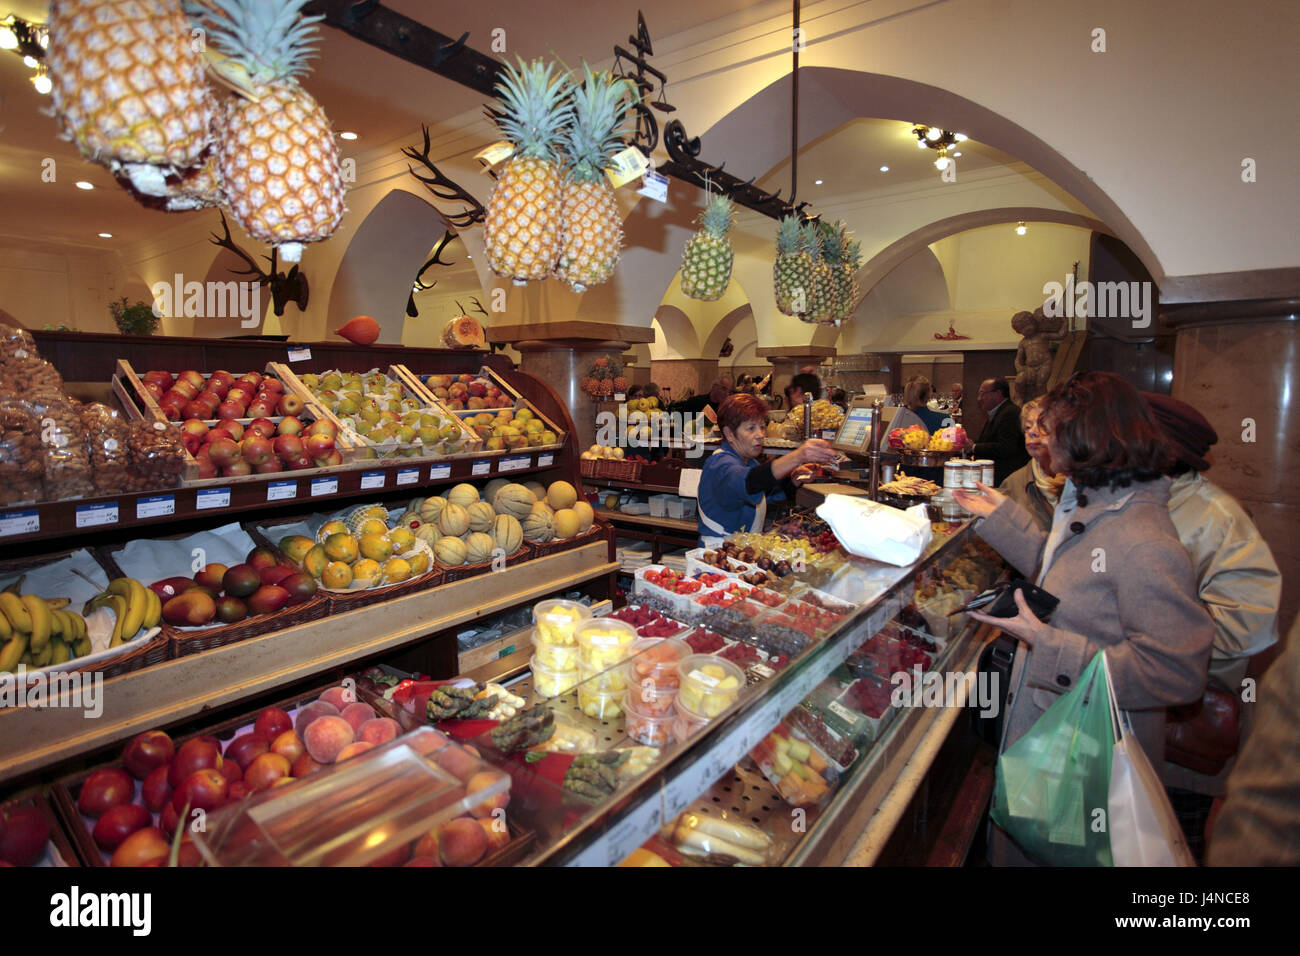 Germany, Bavaria, Munich, 'Feinkost Dallmayr', fruit stall, customer, shop assistant, - Stock Image